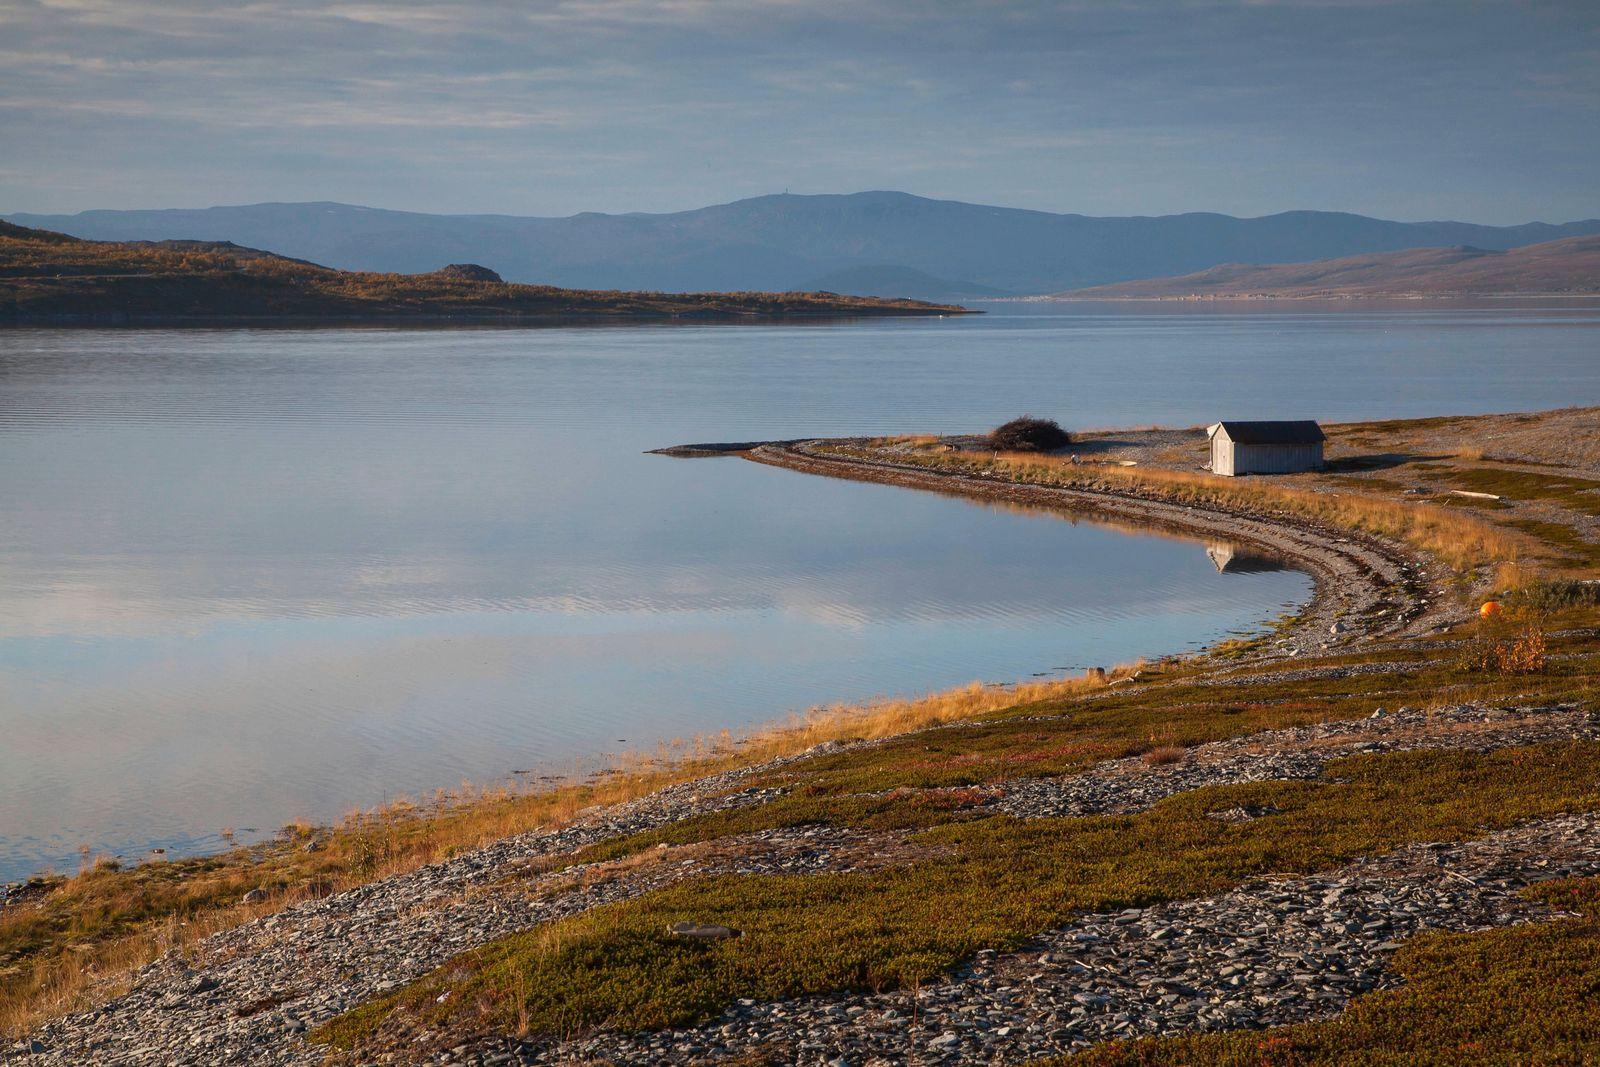 Europe, fjord, autumn, autumn colors, coast, scenery, landscape, Lapland...